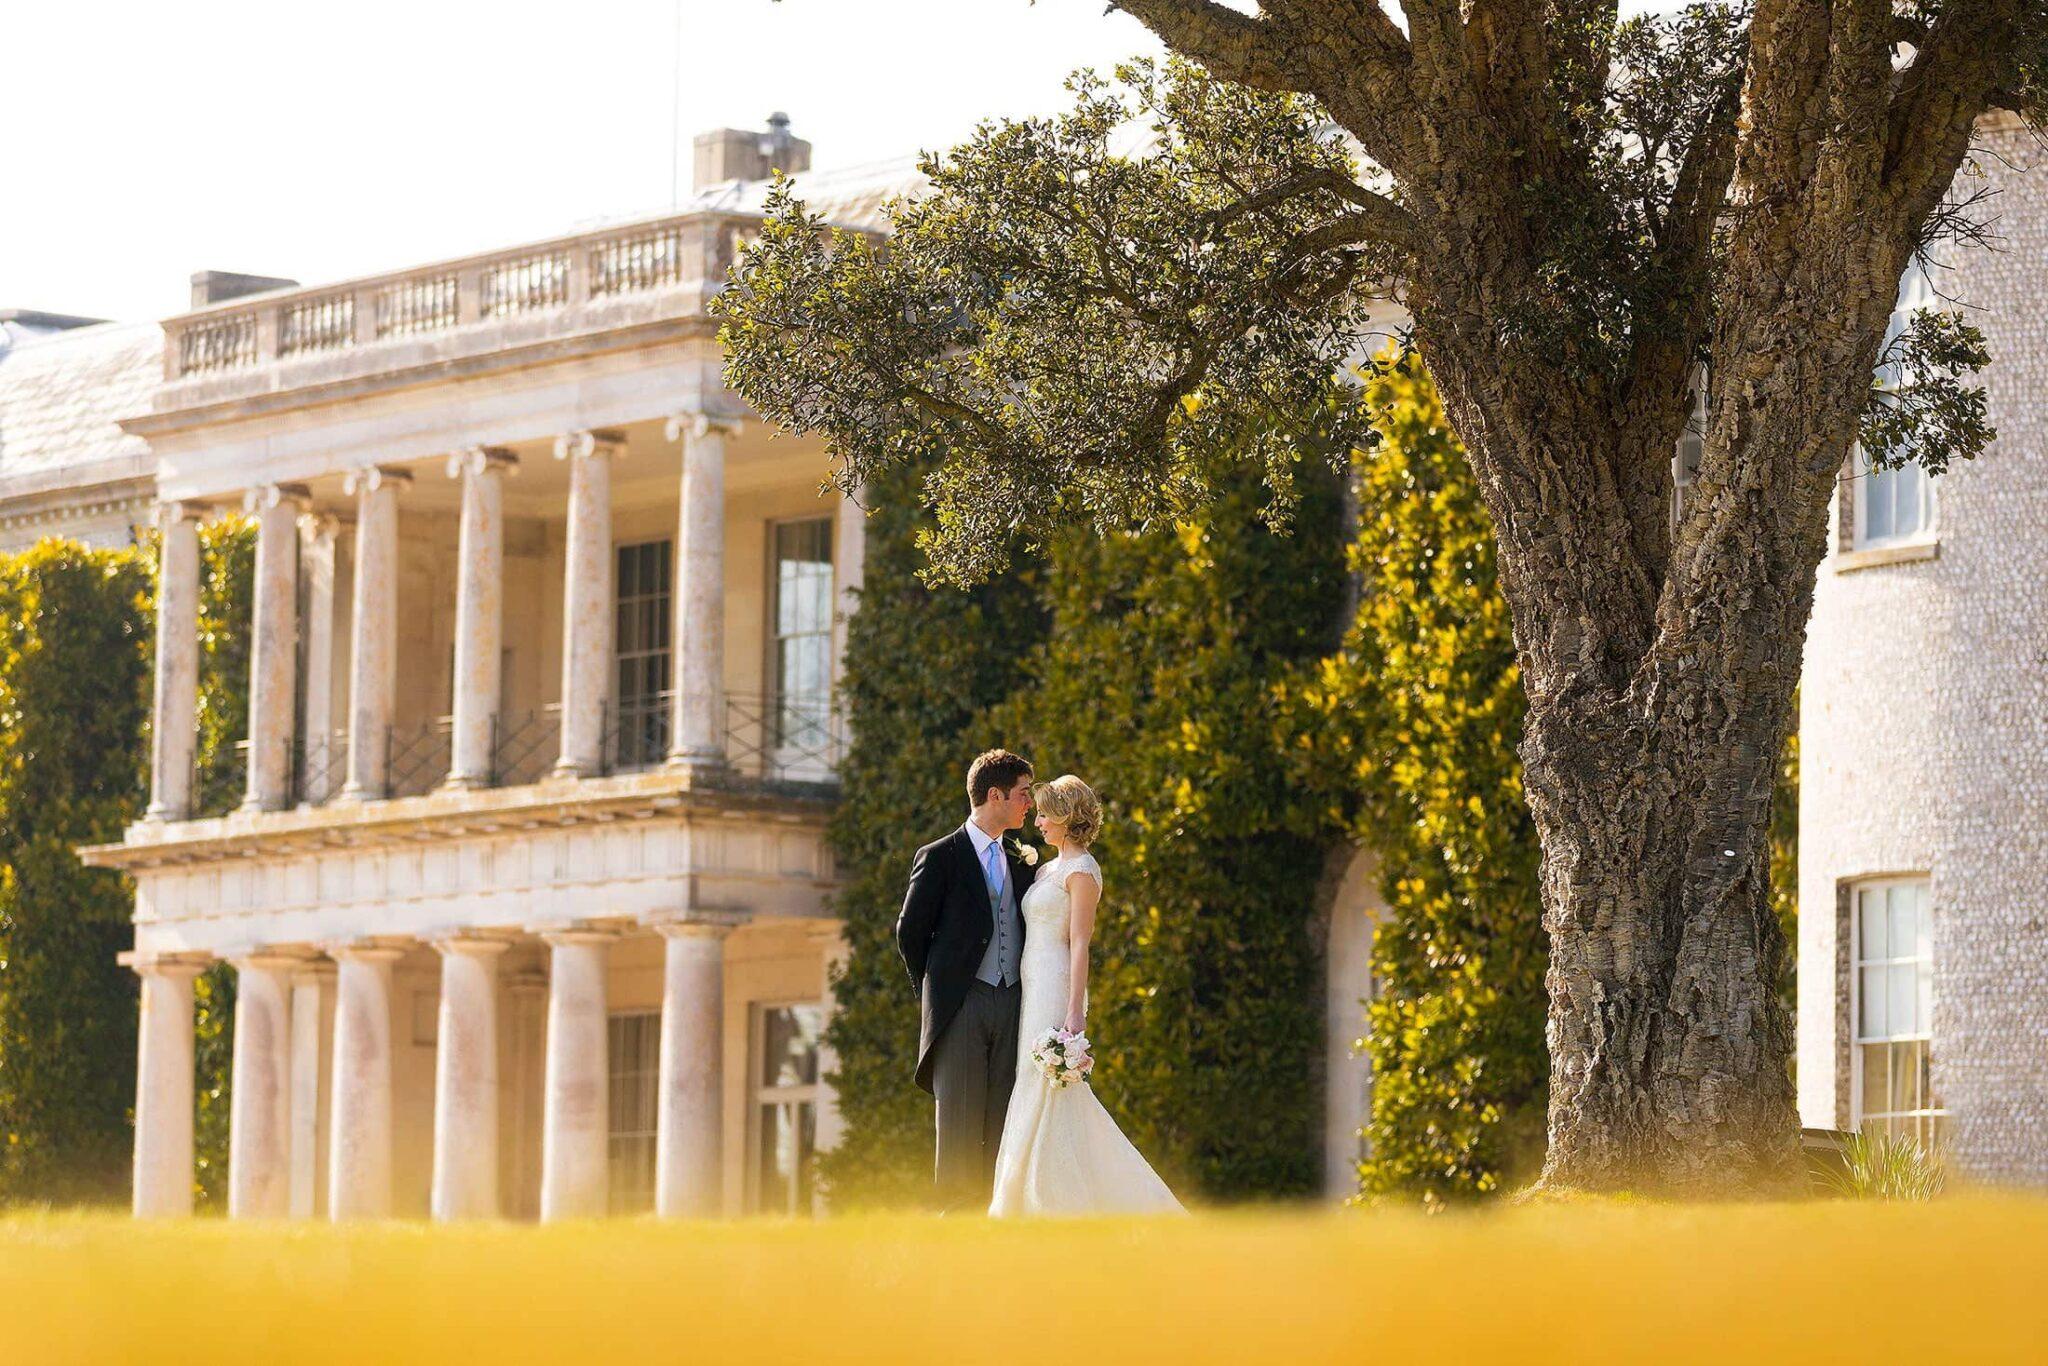 Goodwood House wedding photography of Luke & Jenny